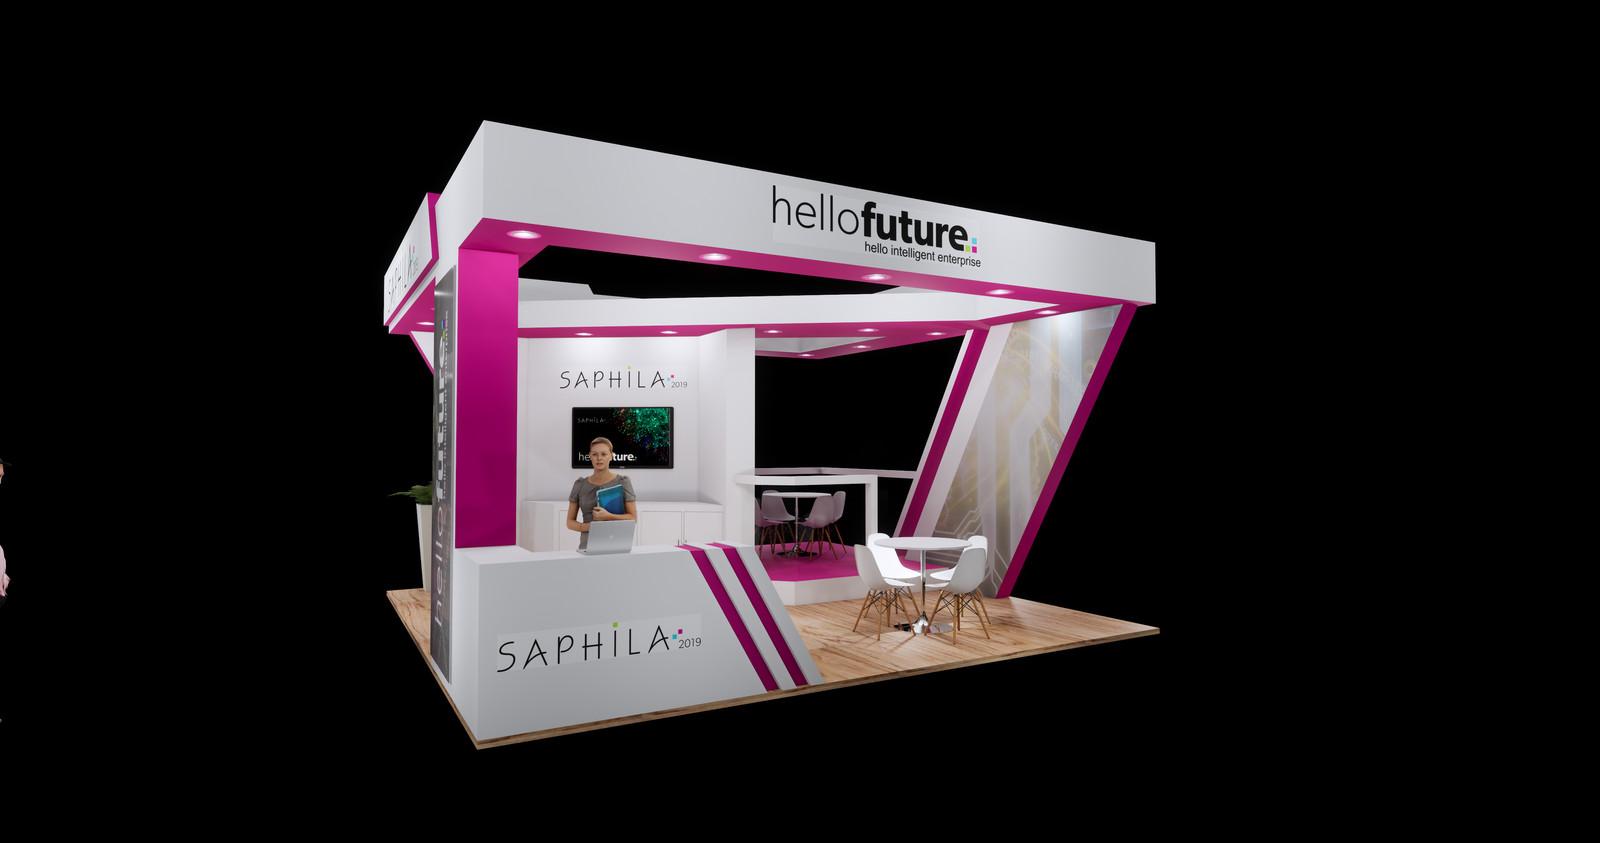 Image result for saphila 2019 app